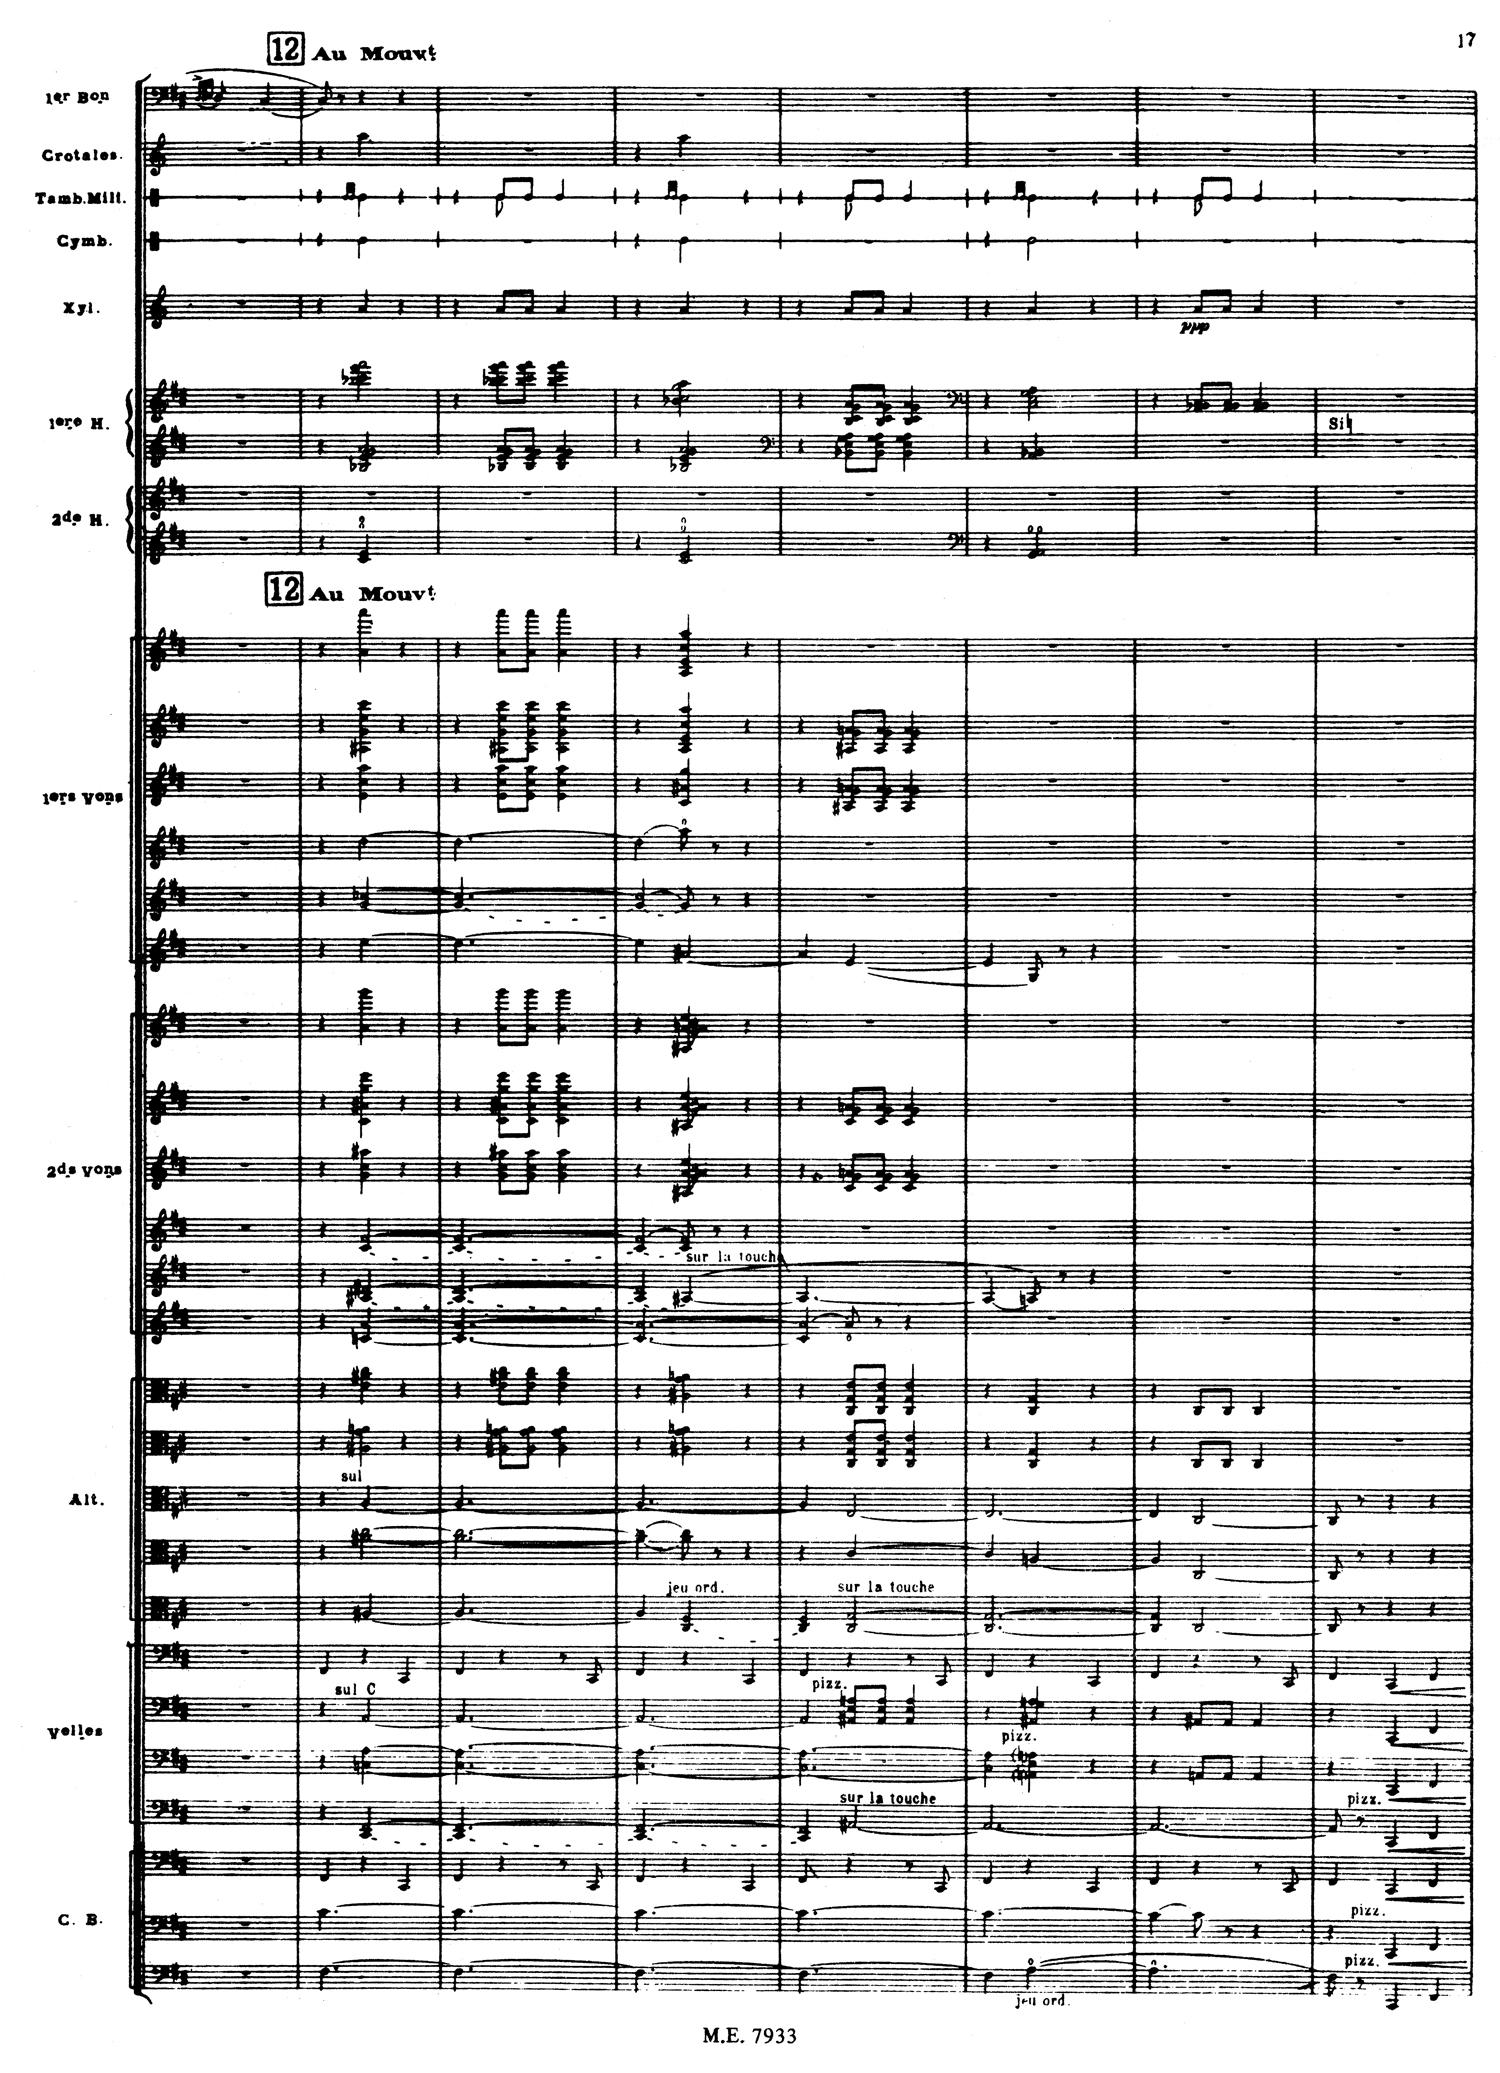 Alborada Score 4.jpg